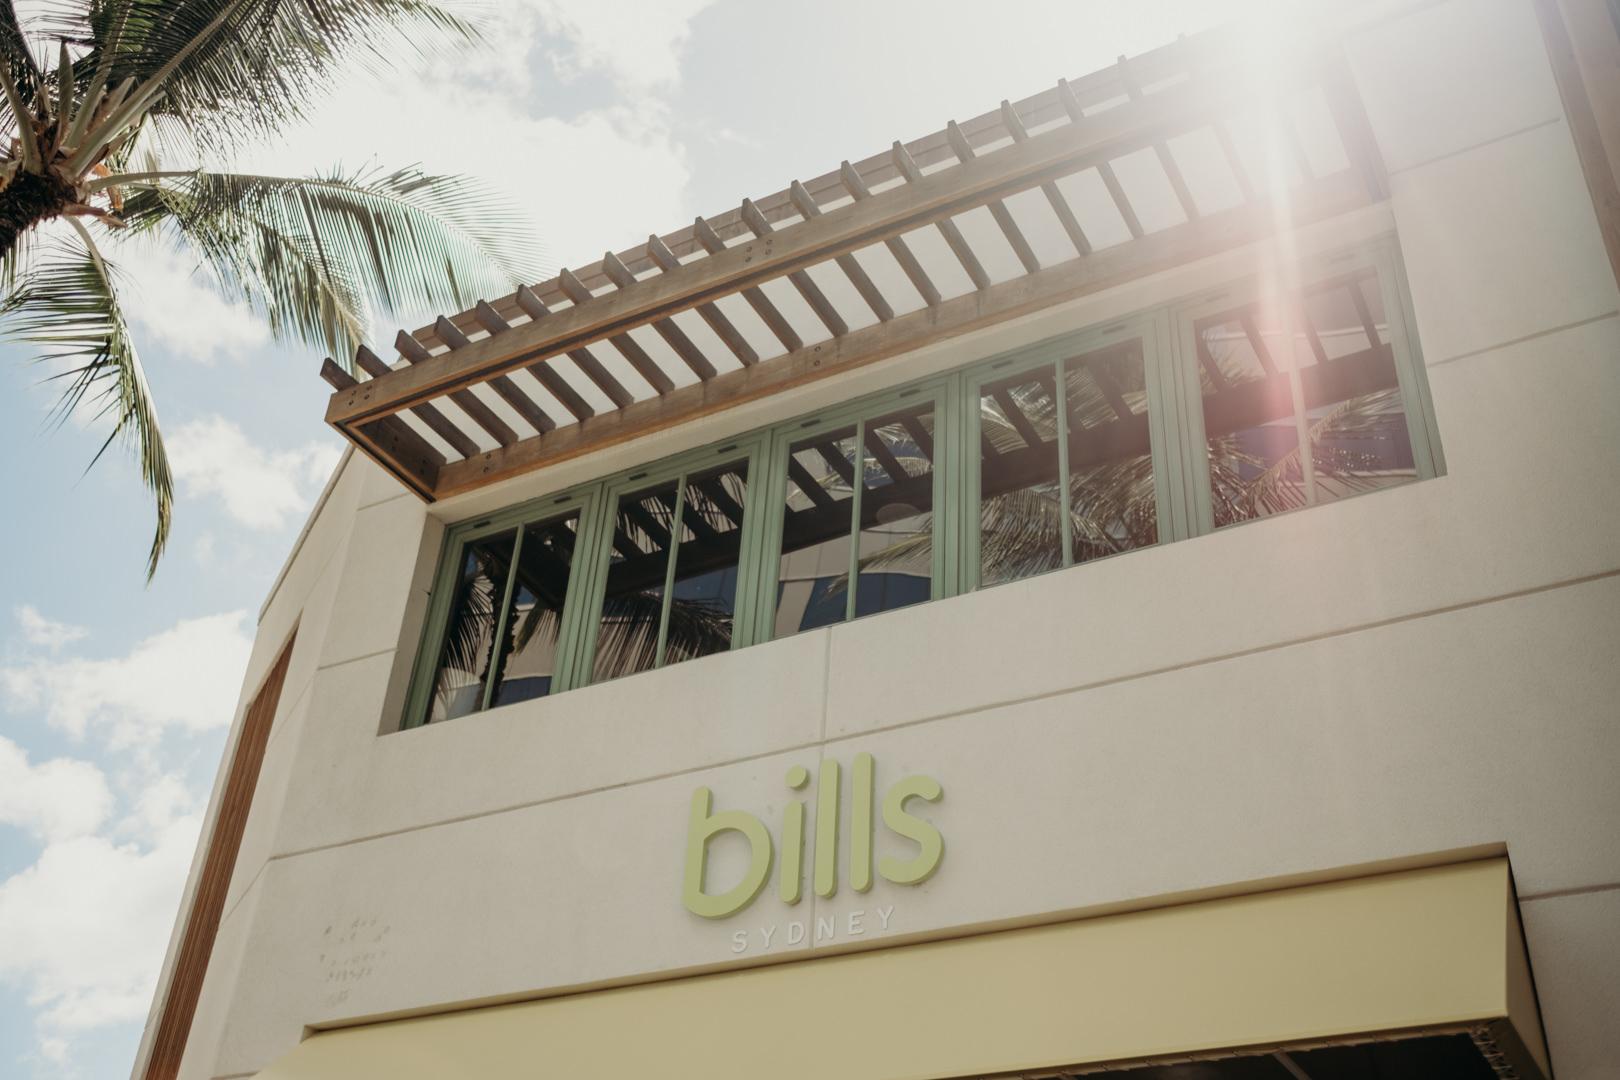 20180423_Visit Hawaii_Honolulu_Bills Sydney_9.jpg